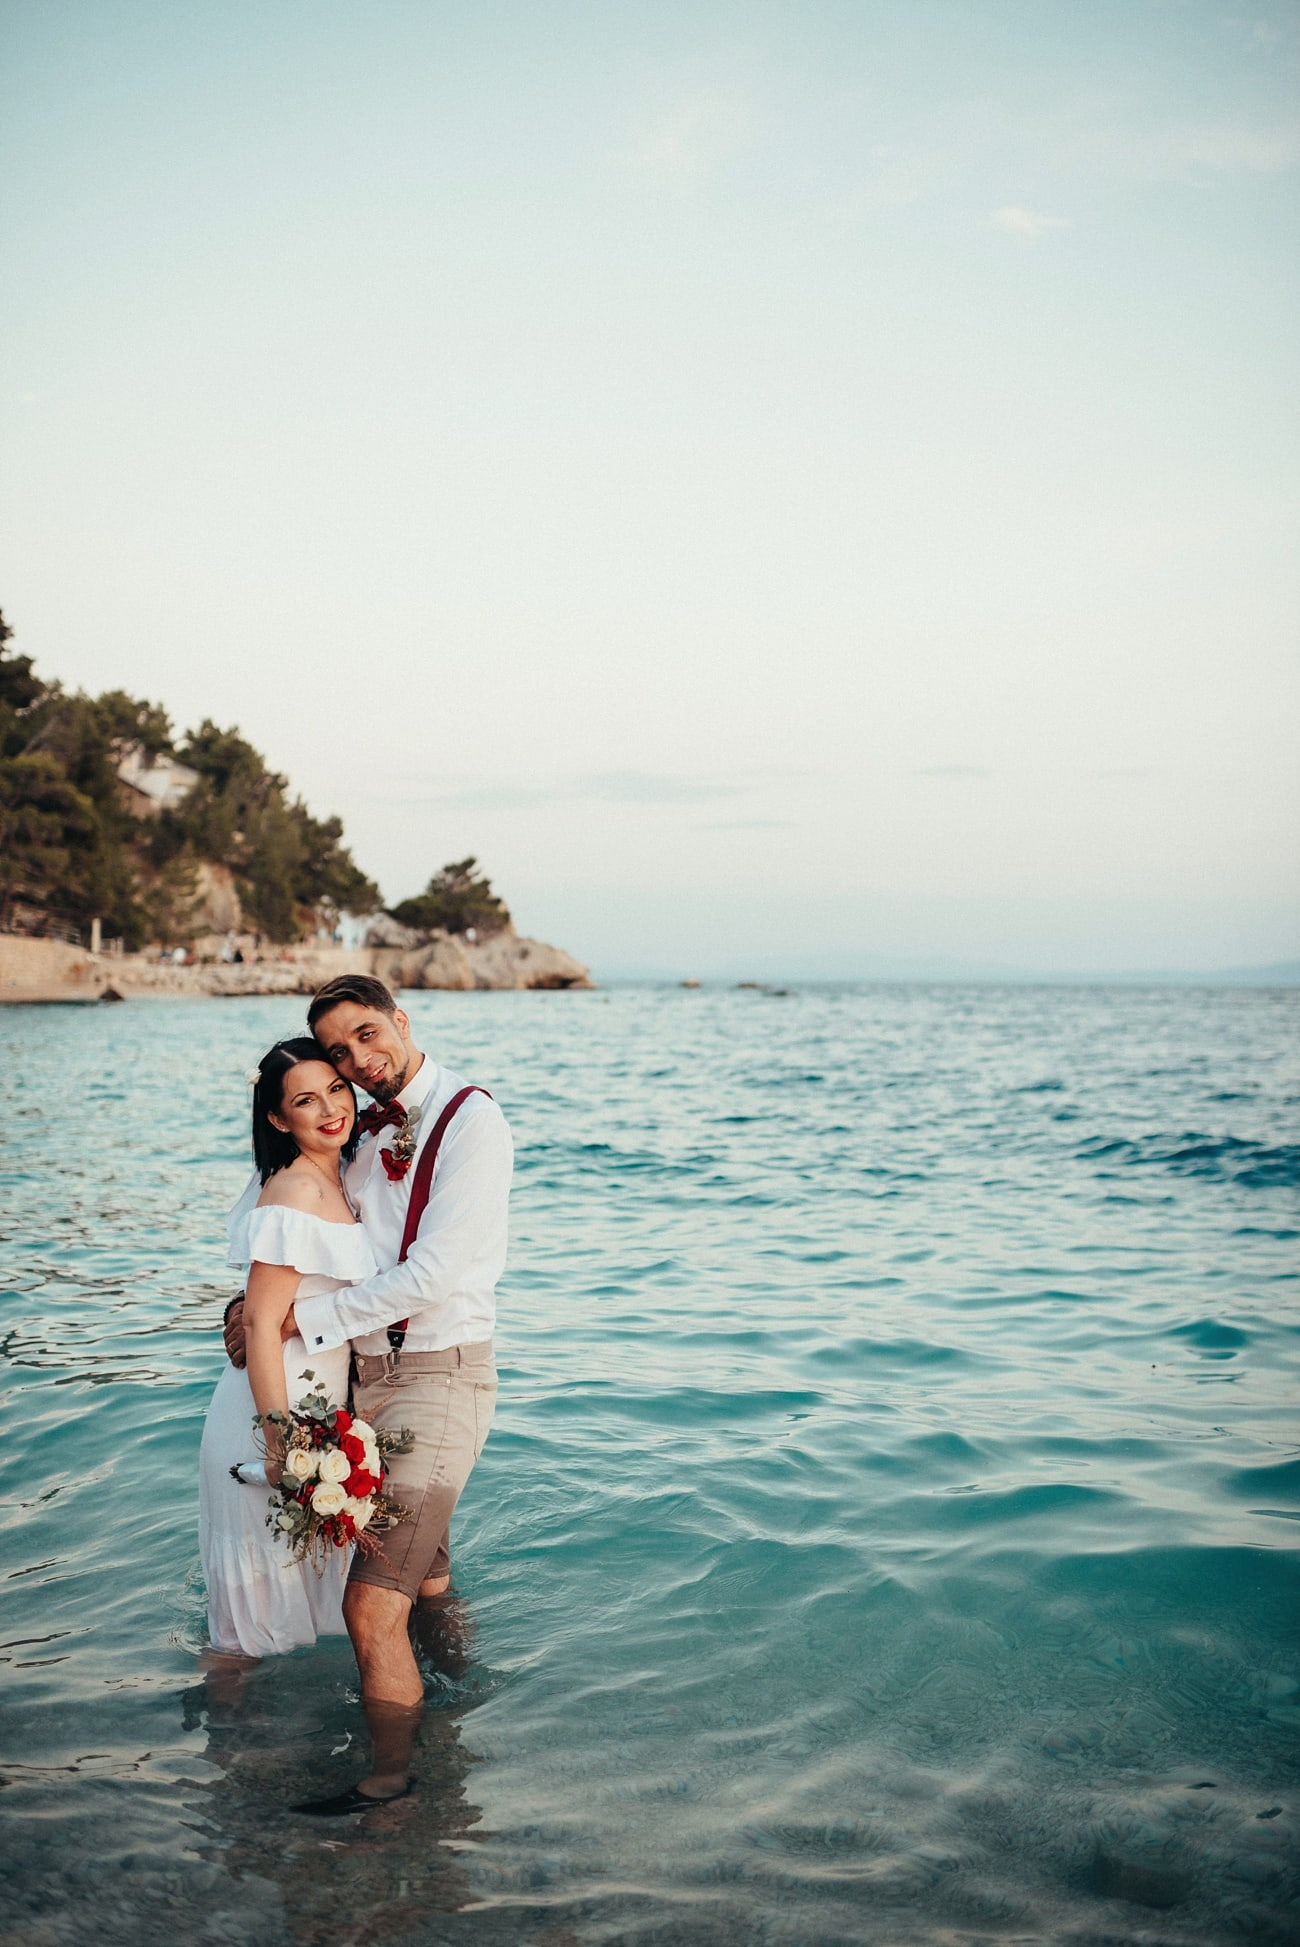 biokovo skywalk wedding photographer 0026 - Biokovo Skywalk Wedding